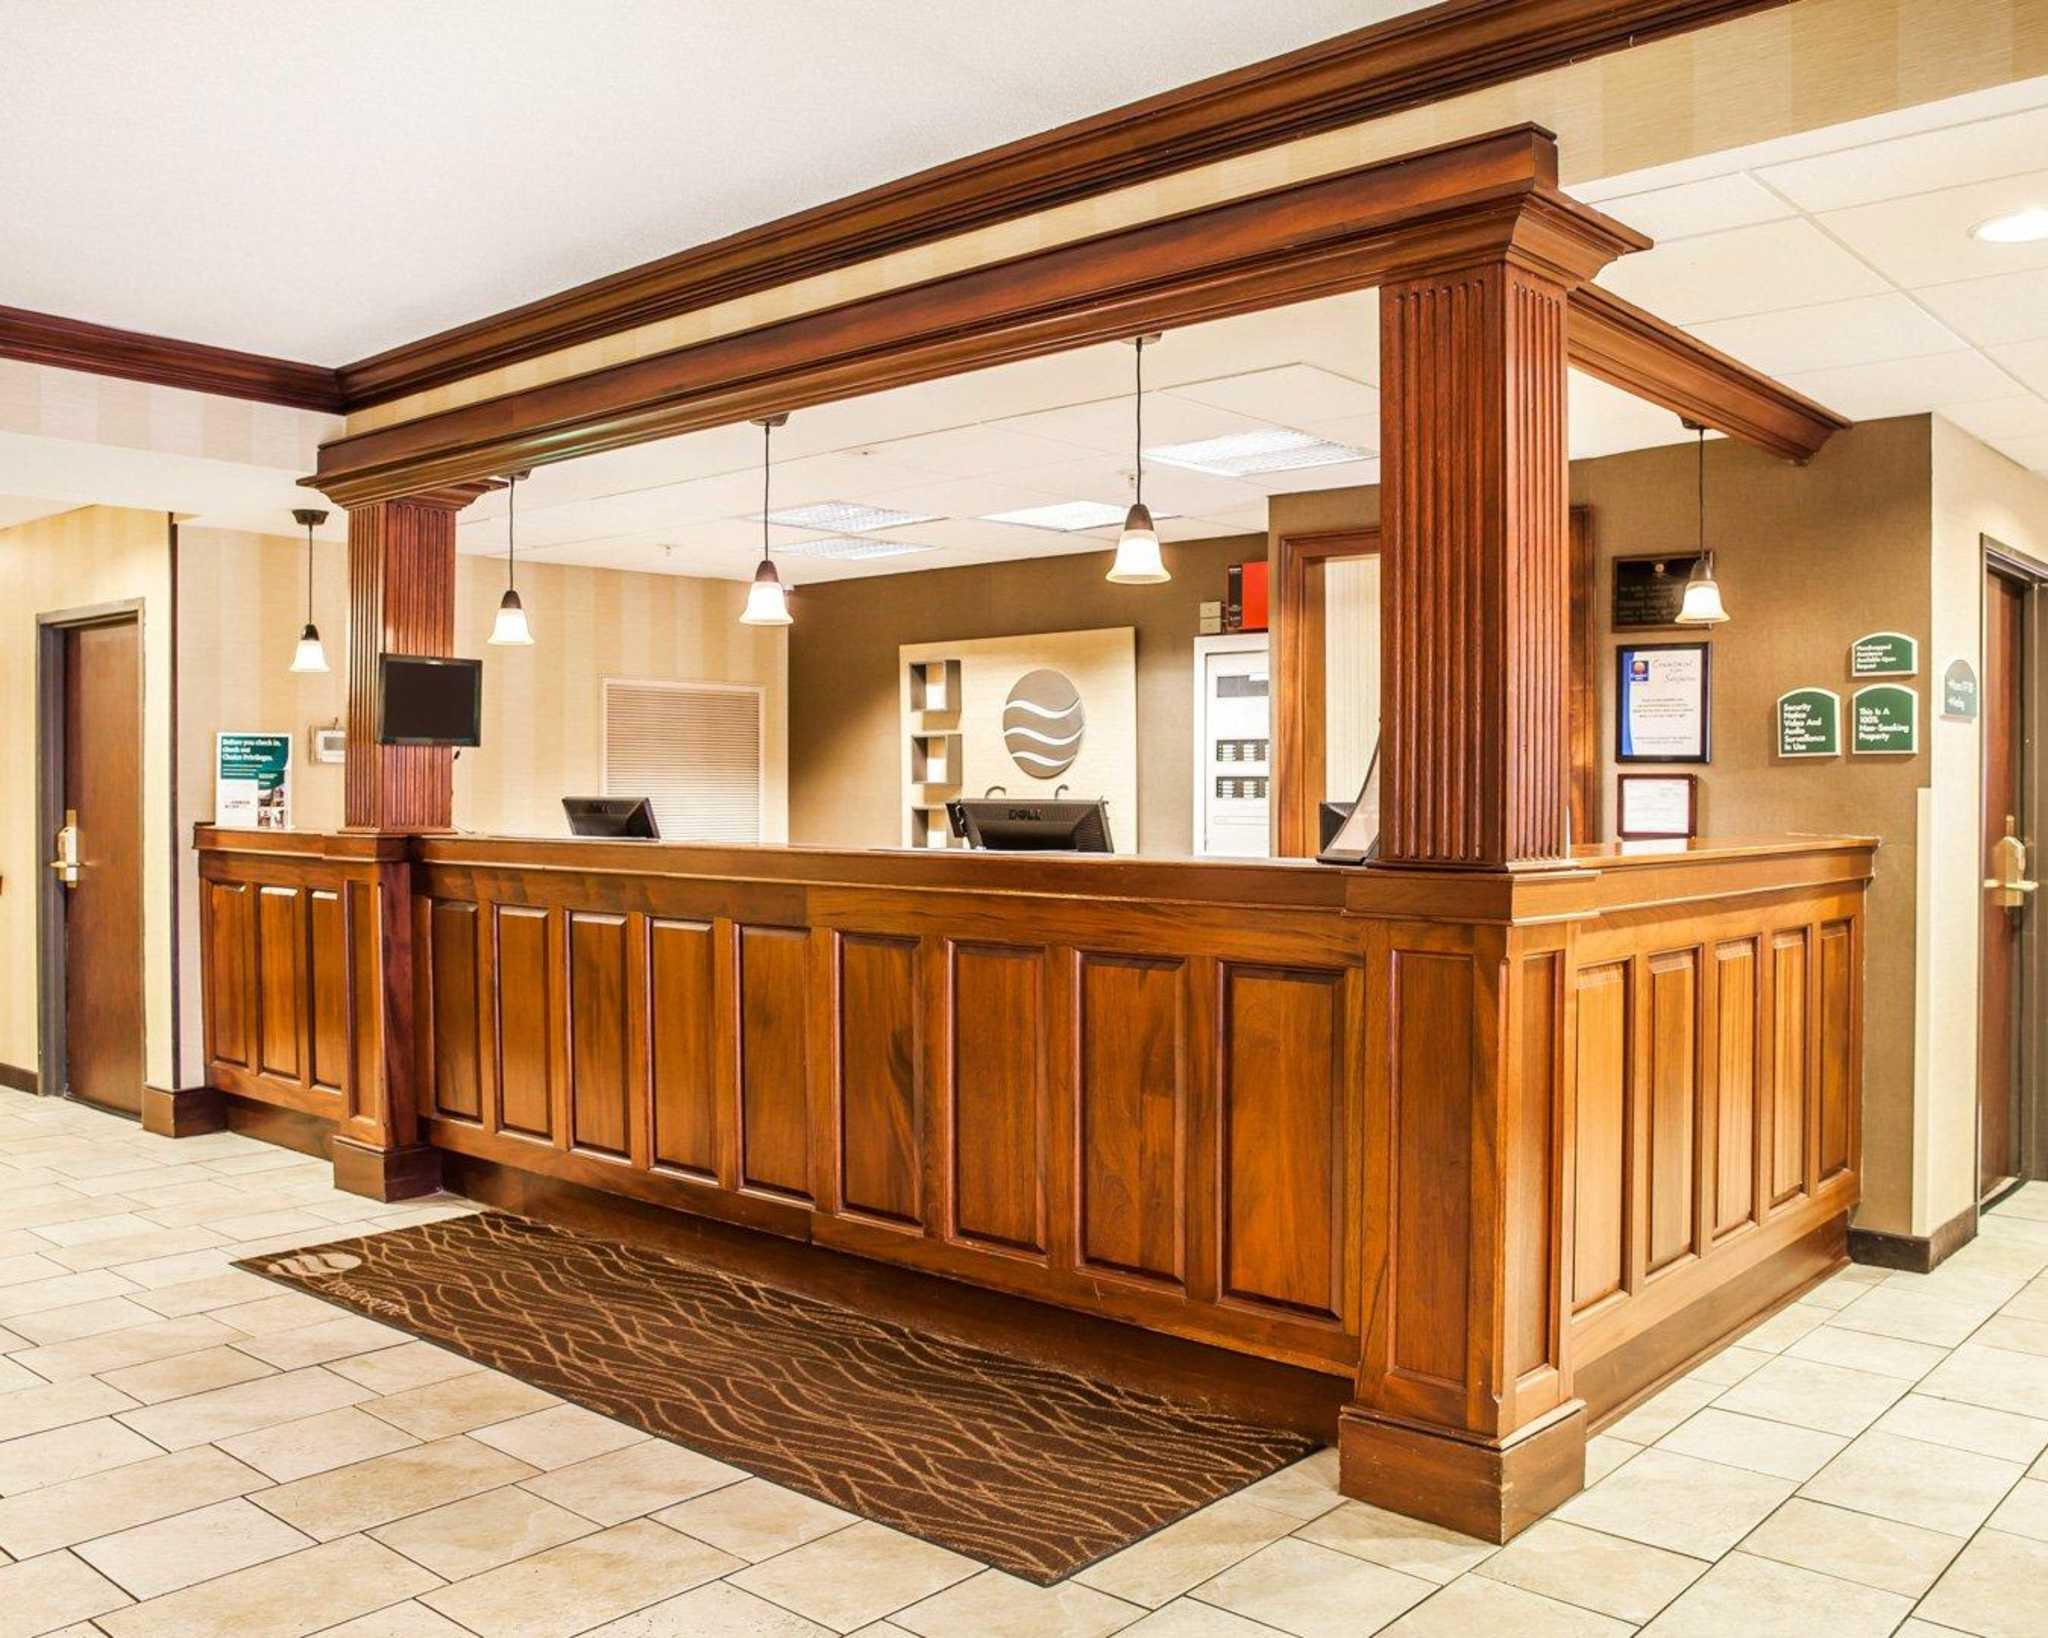 Comfort Inn & Suites Pottstown - Limerick, Pottstown ...